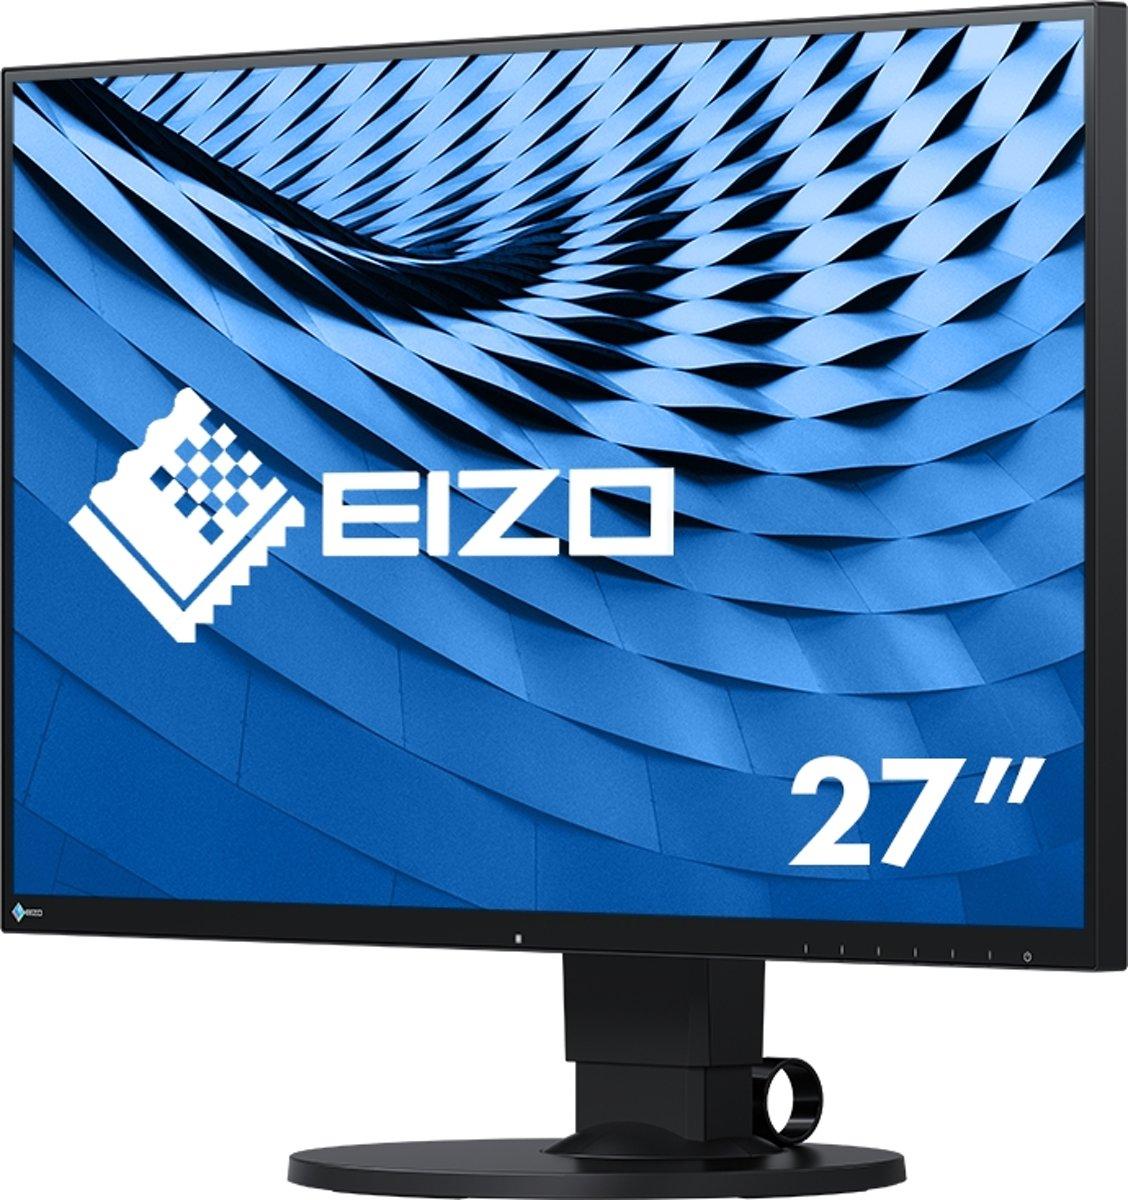 EIZO EV2780-BK FlexScan Led-monitor